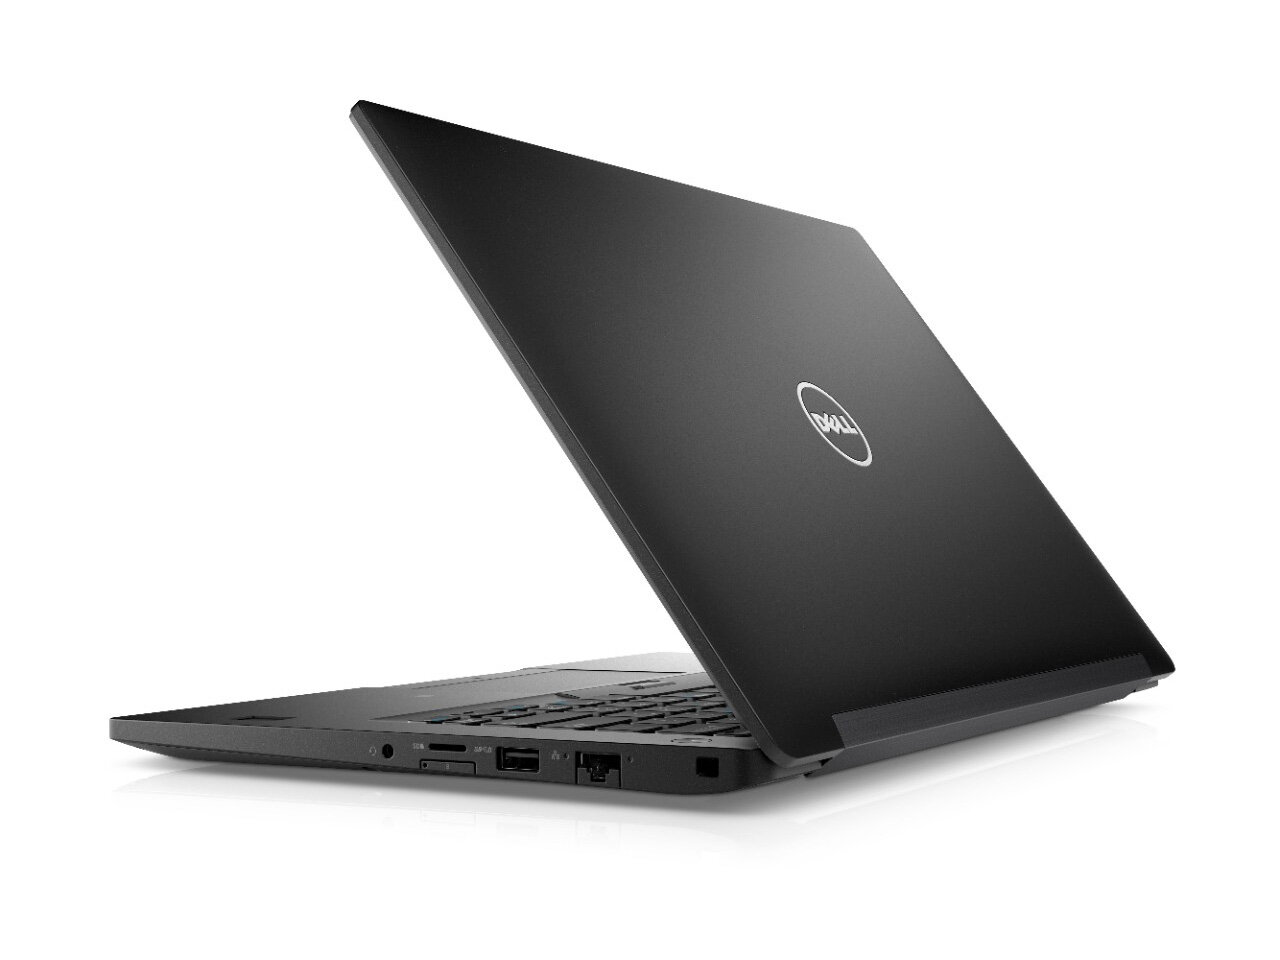 Laptop Dell Latitude 7480 42LT740006 - Intel core i5, 8GB RAM, SSD 256GB, Integrated HD Graphics 620, 14 inch